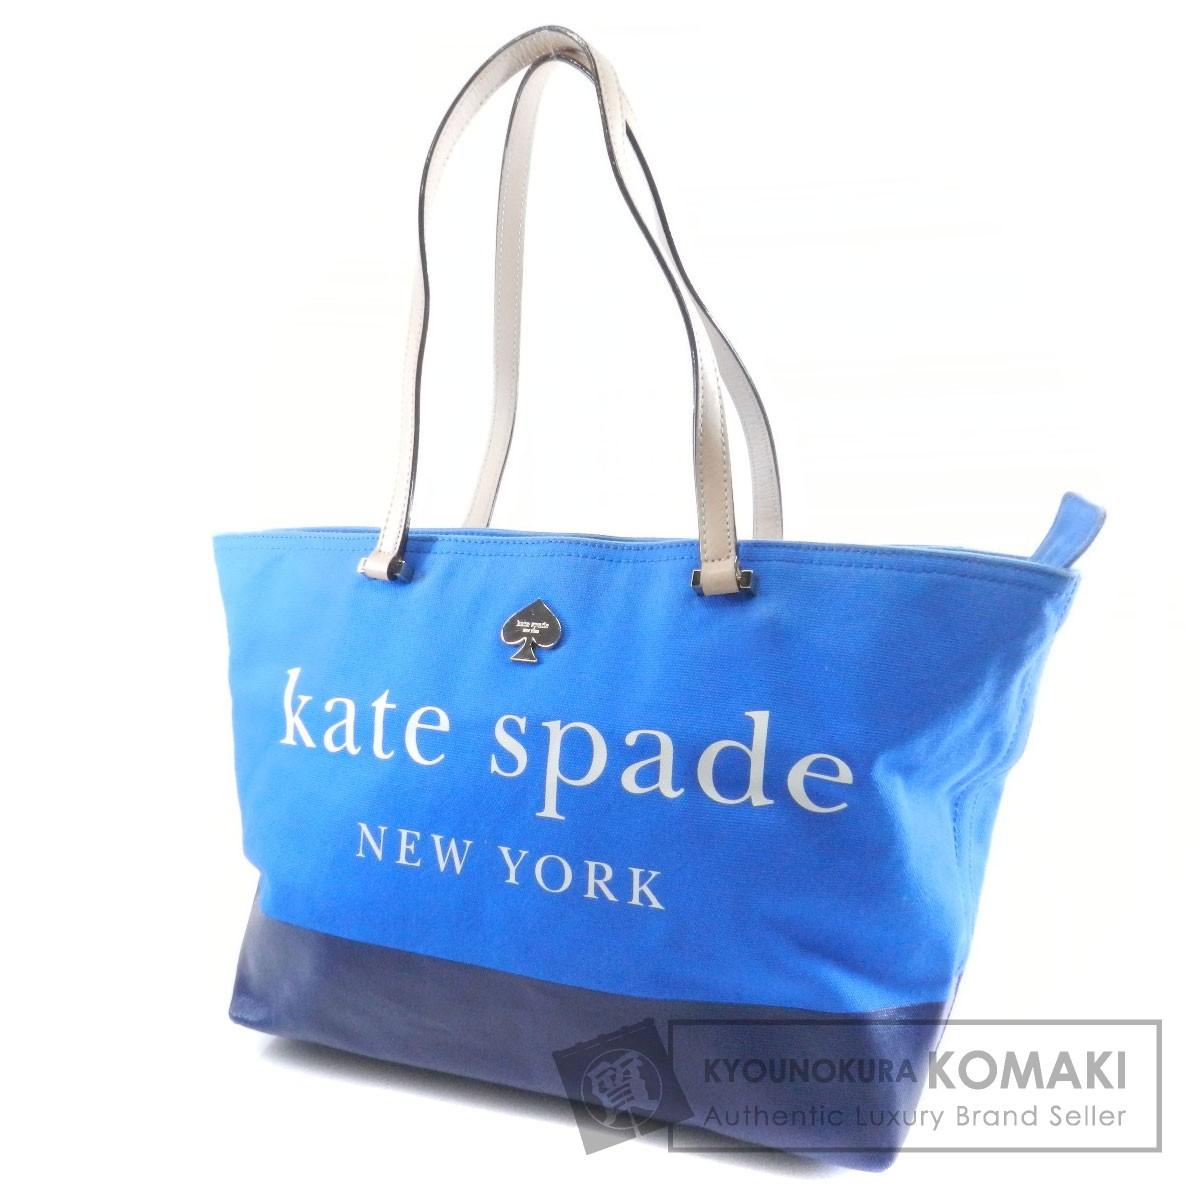 kate spade ロゴモチーフ トートバッグ キャンバス レディース 【中古】【ケイトスペード】